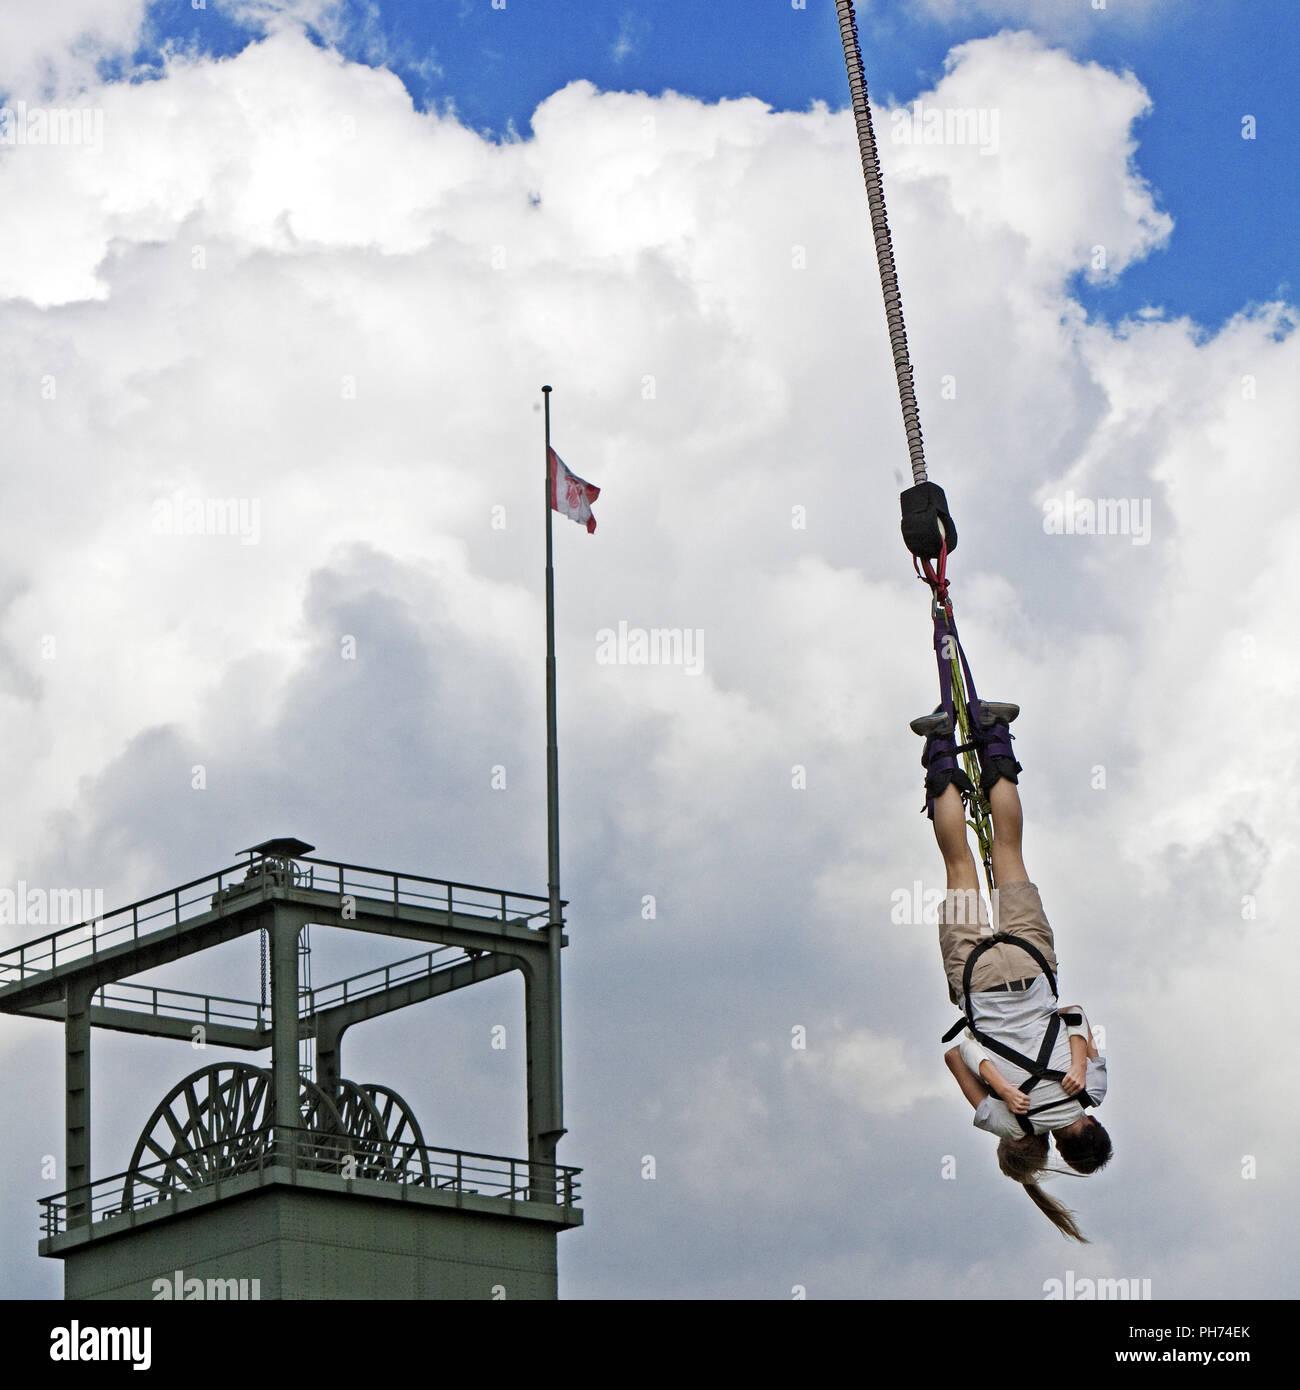 Bungee Jumping, Oberhausen, Germany Stock Photo